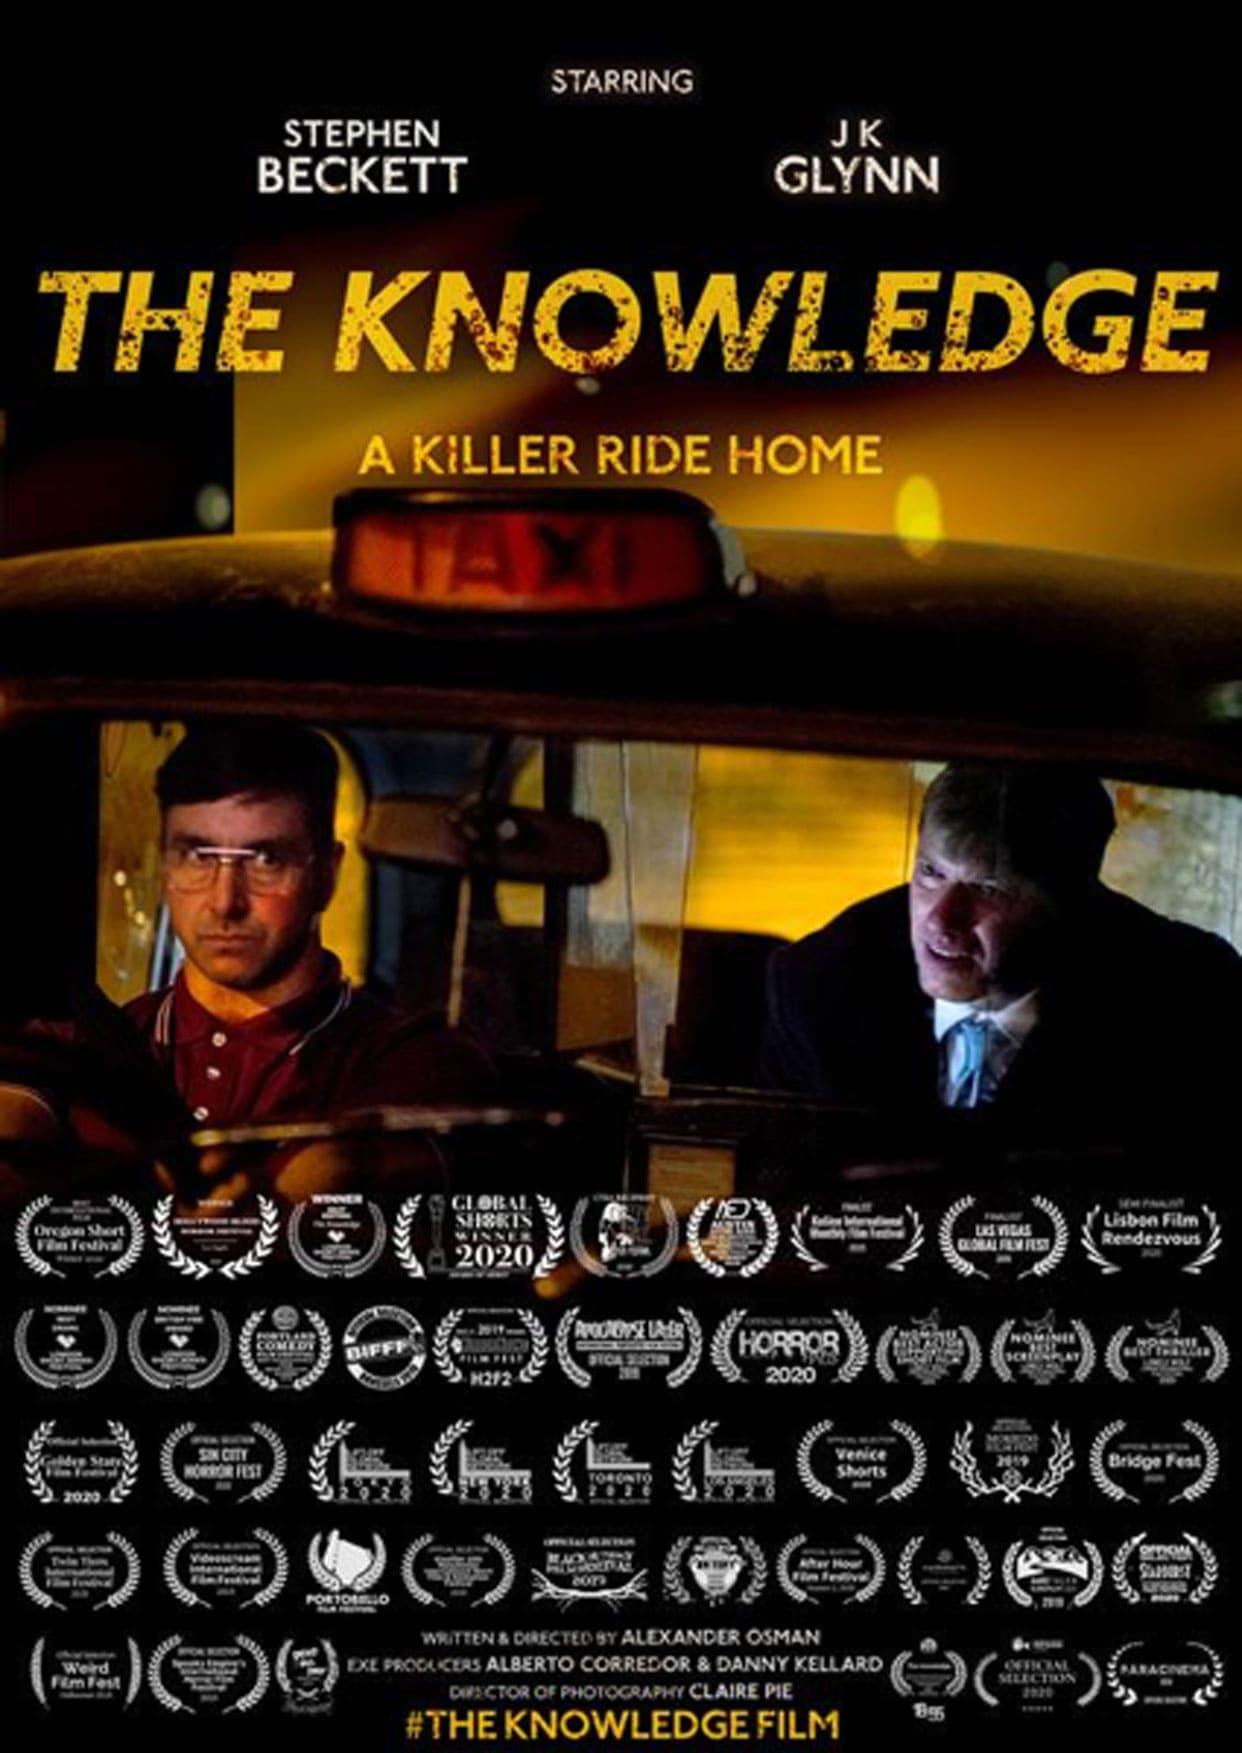 THE-KNOWLEDGE-Alexander-Osman